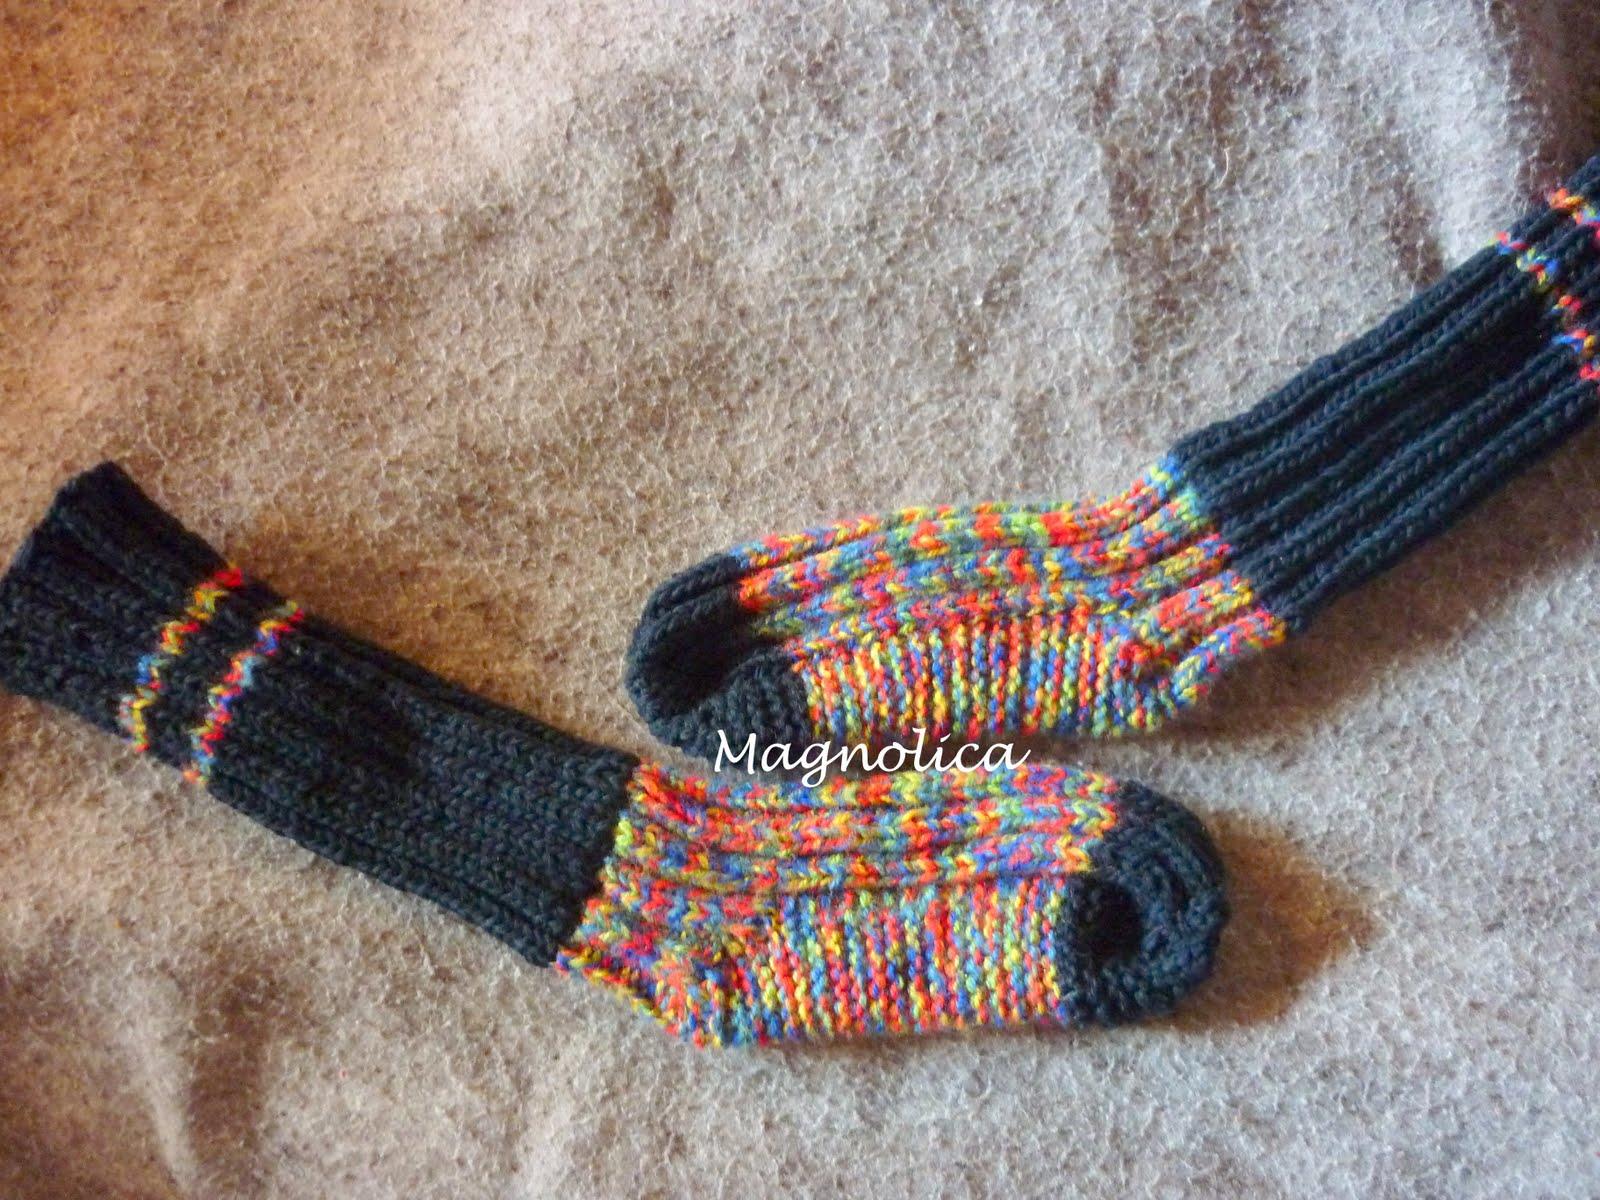 Magnolica: Medias o calcetas...nunca digas nunca